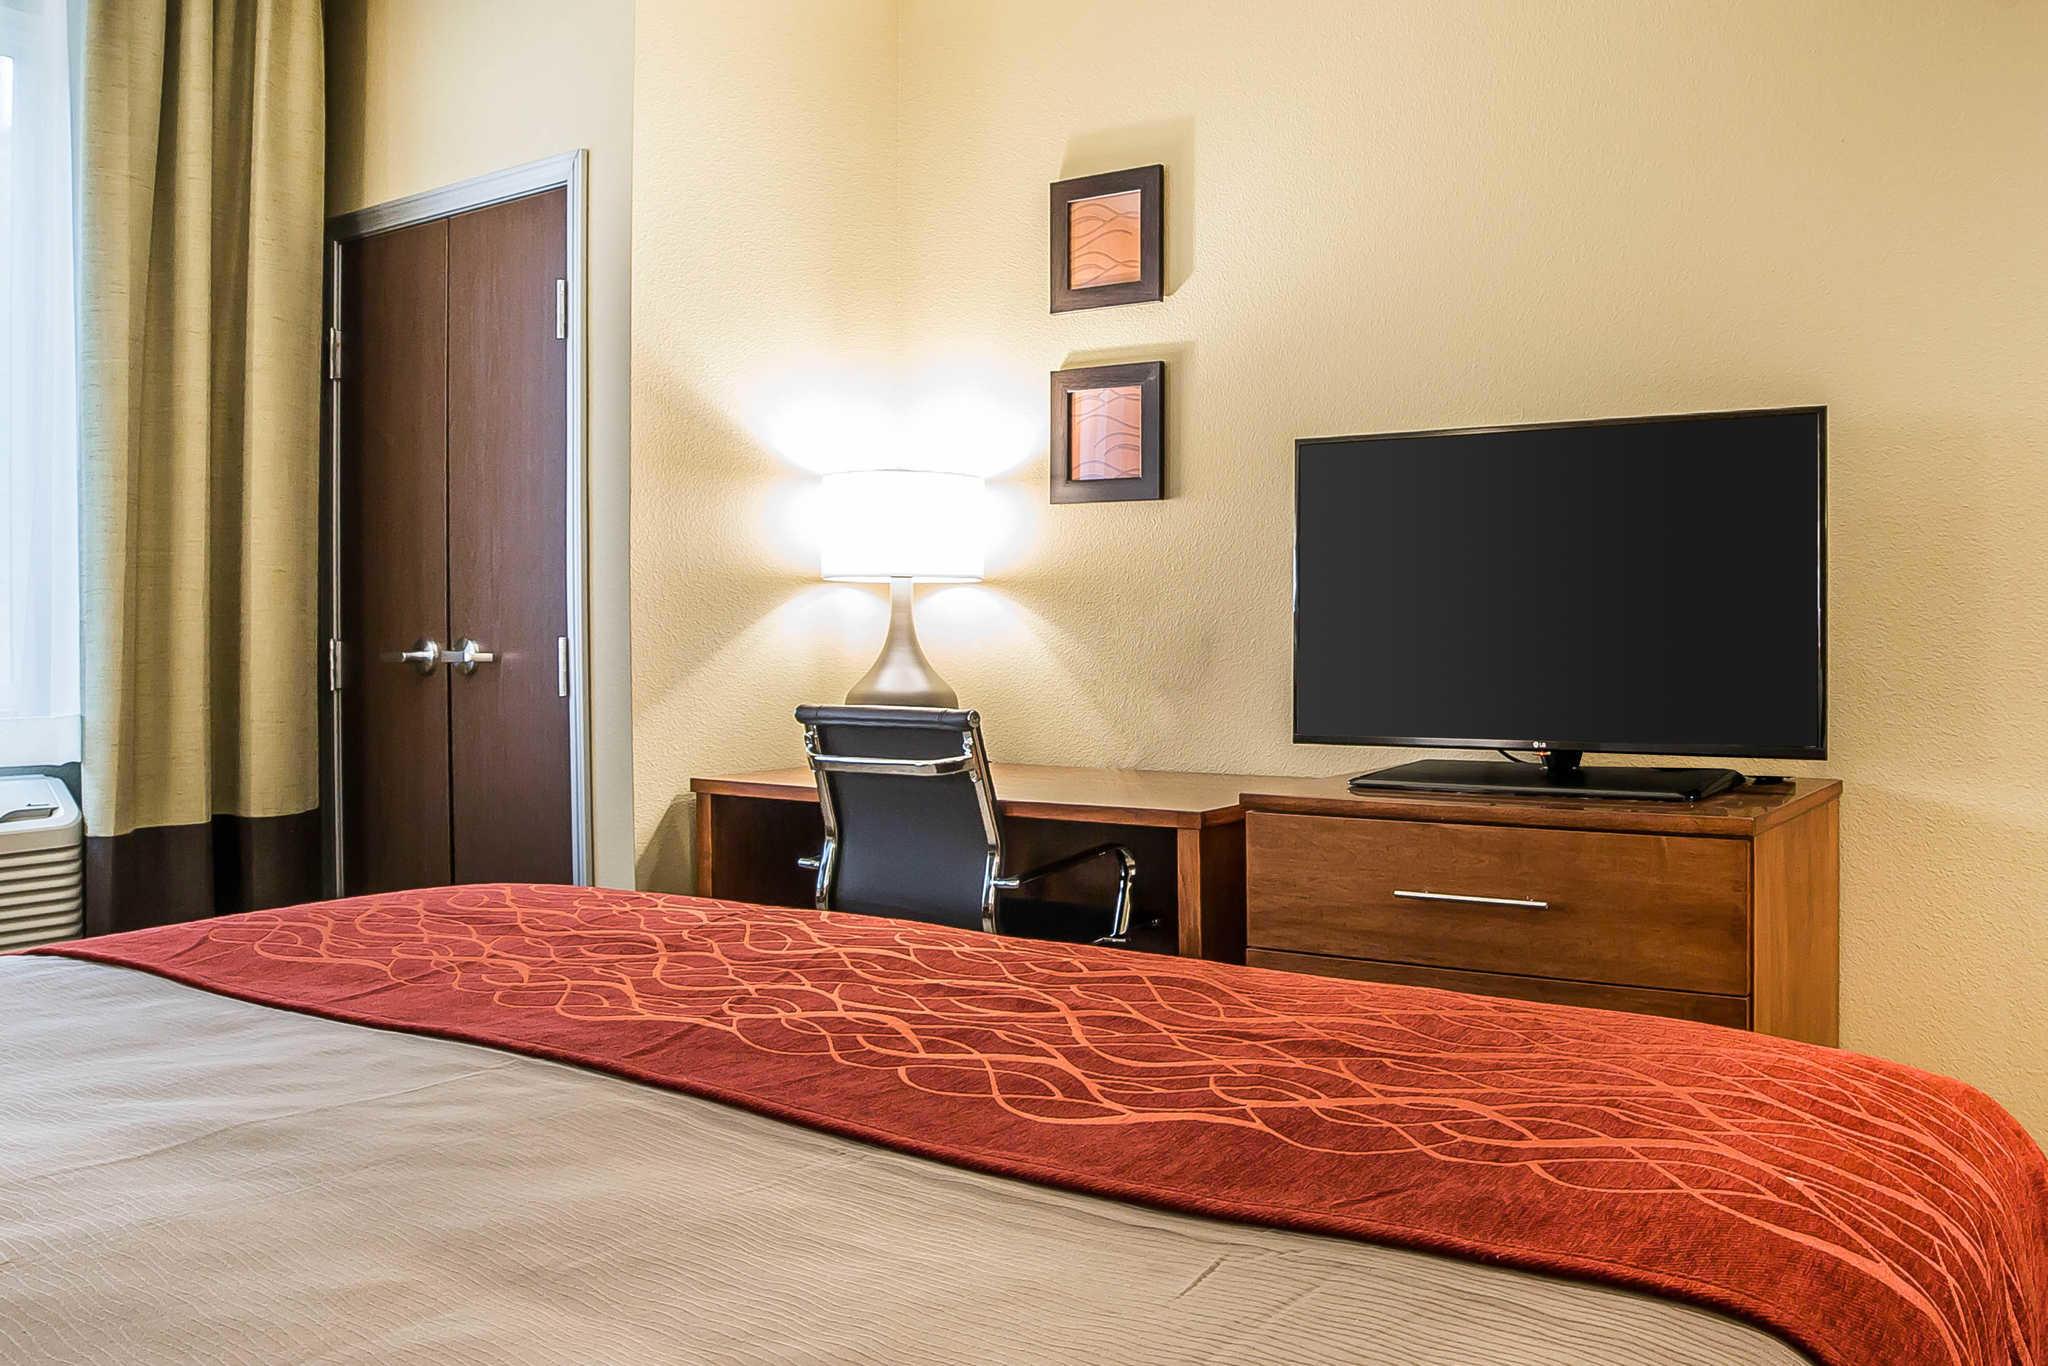 Comfort Inn & Suites Near Mt. Rushmore image 9